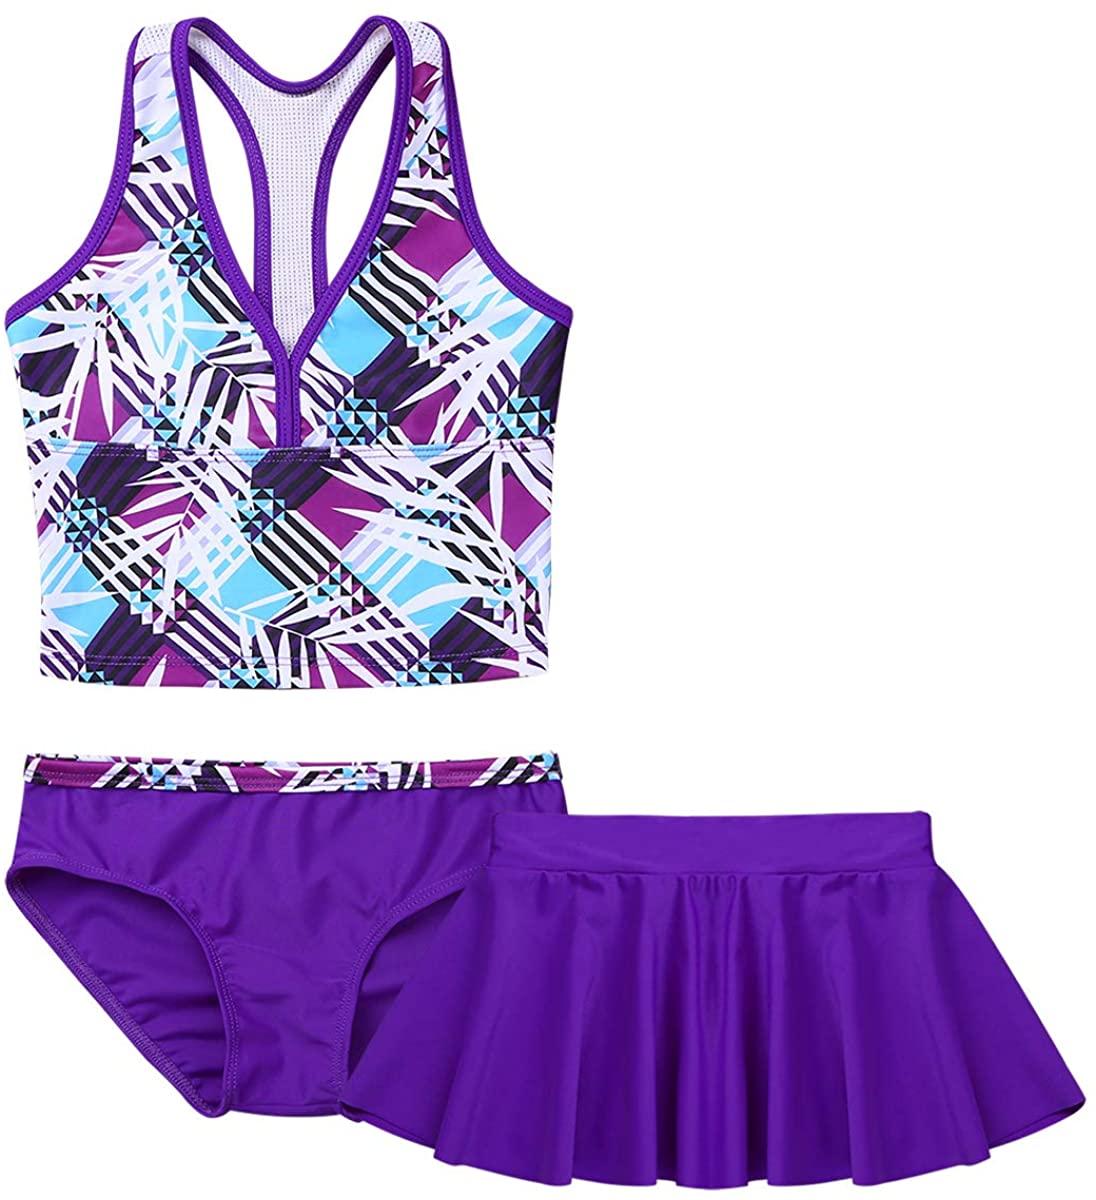 Haitryli Kids Girls 3 Piece Swimwear Swimsuit Tankini Outfits Sleeveless Racer Back Tops with Bottoms Skirts